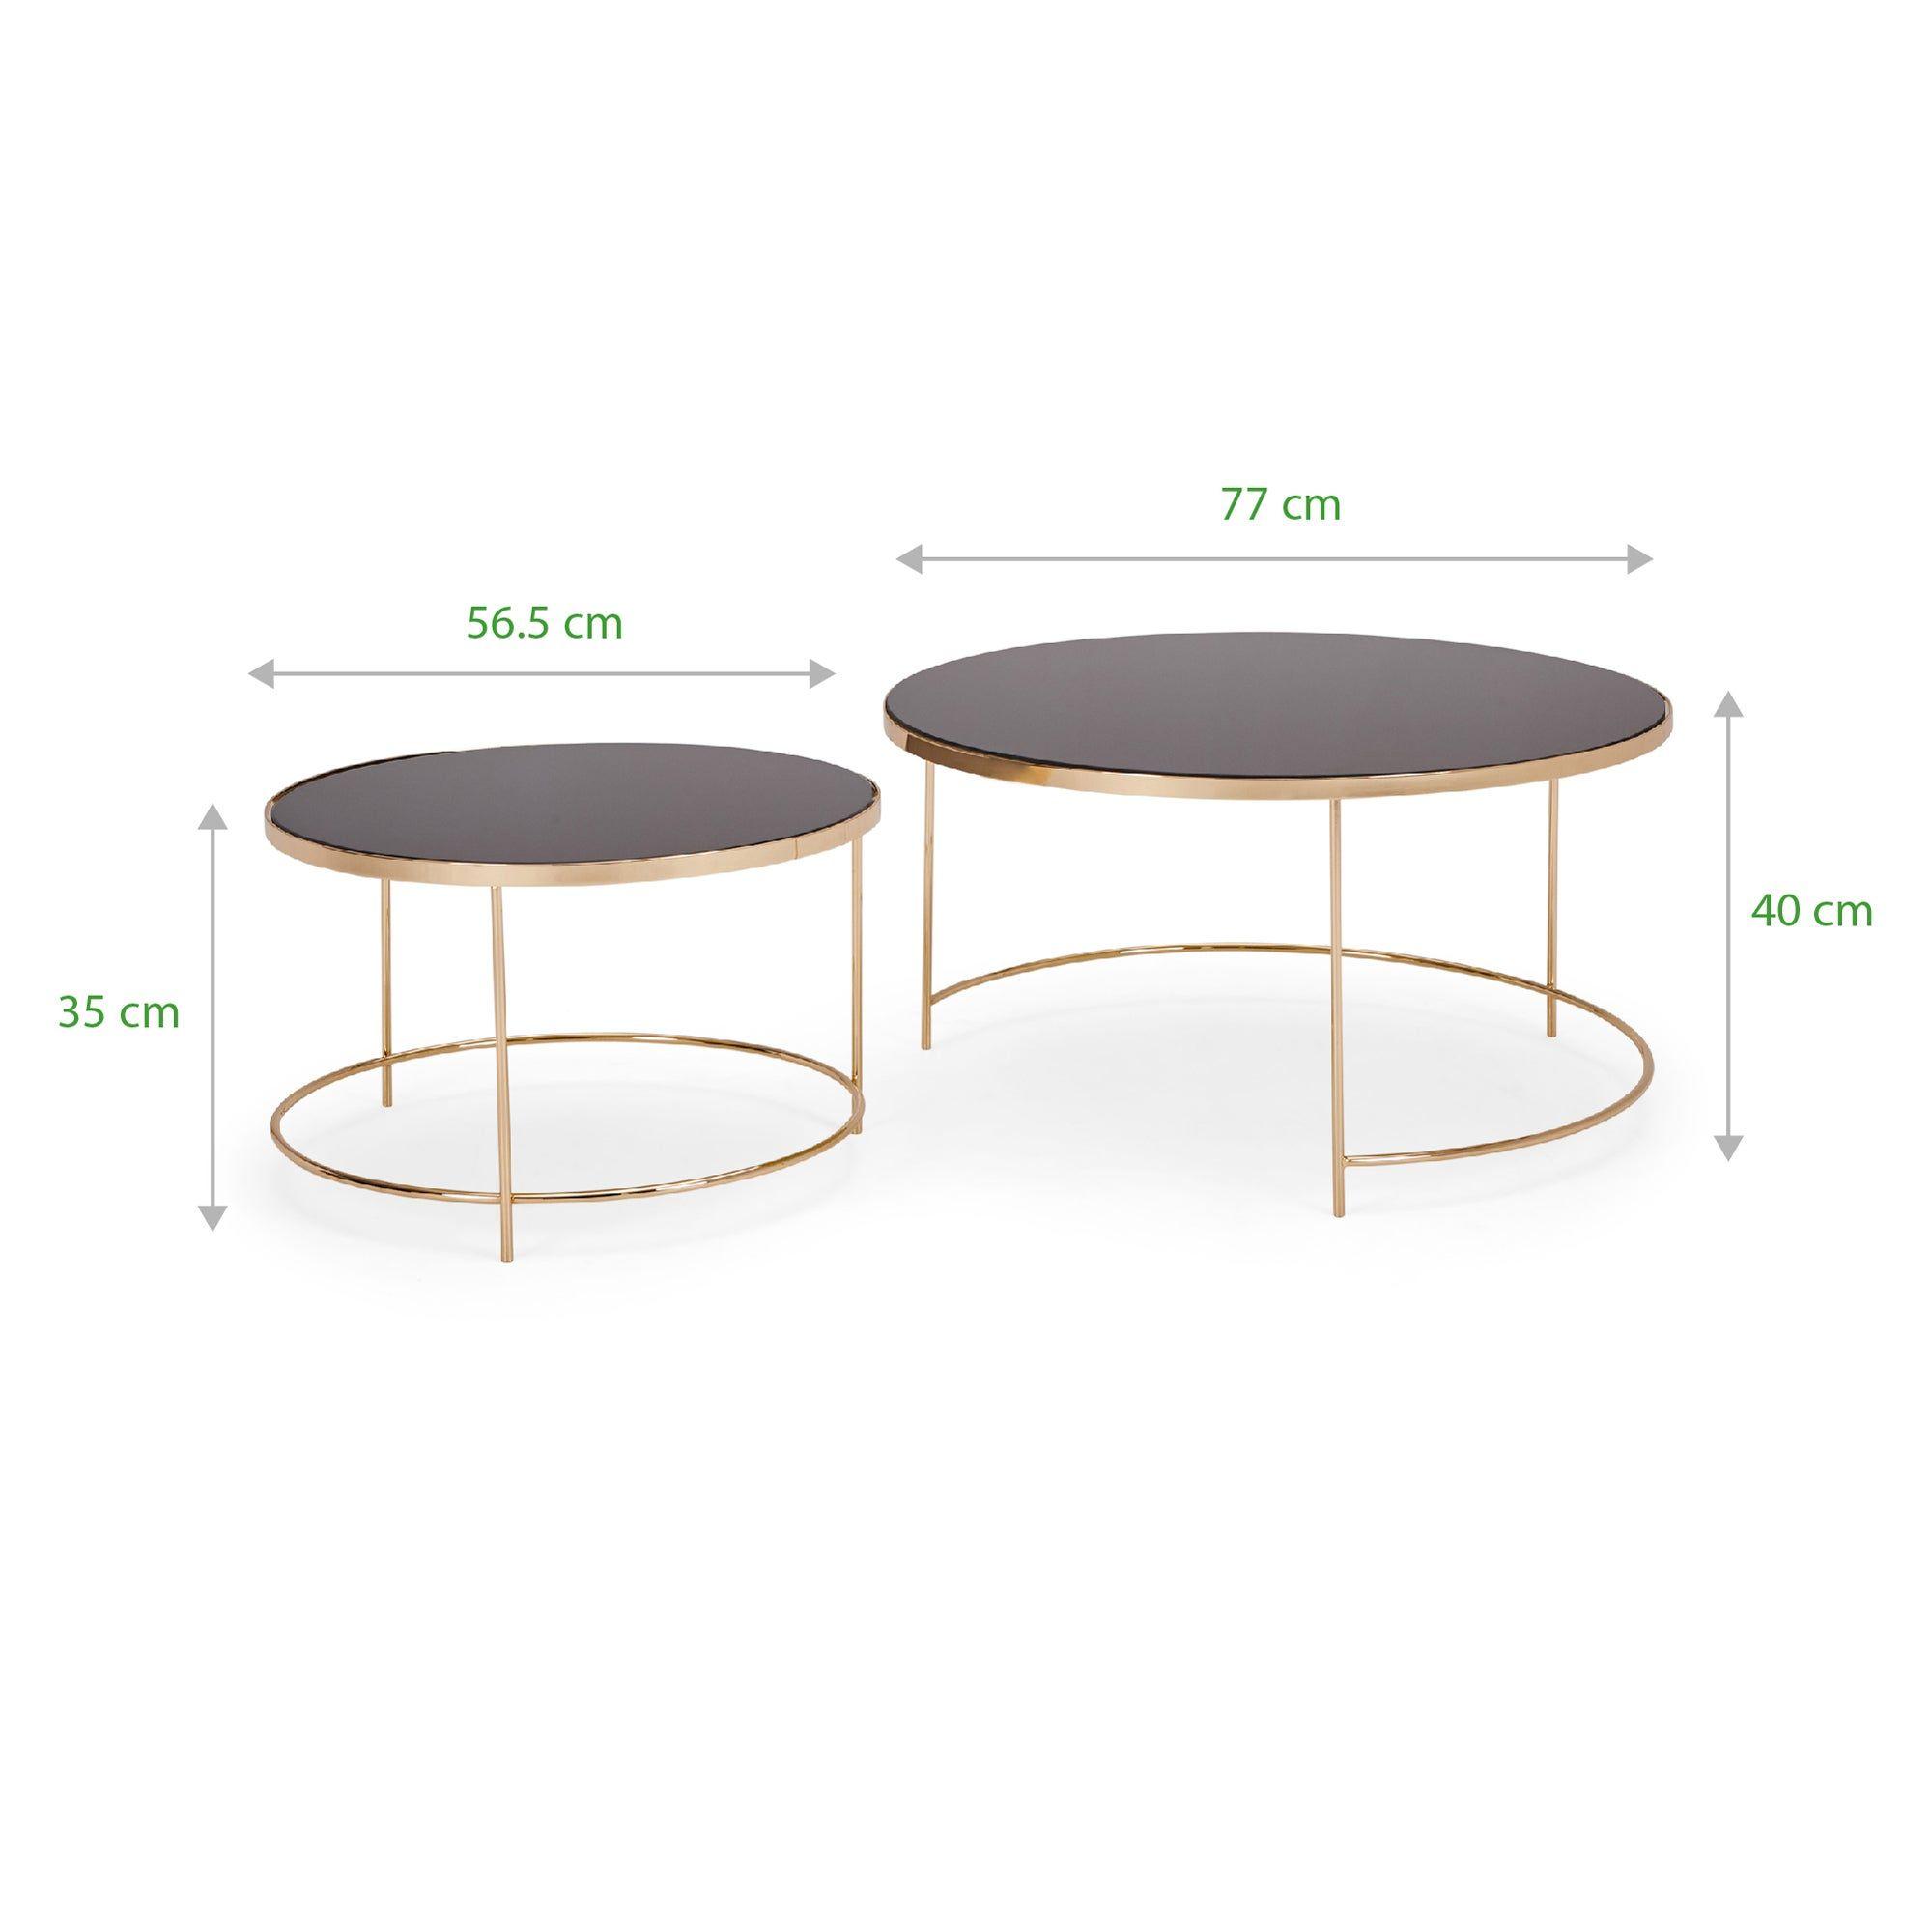 Ritz Black Set Of 2 Coffee Tables Coffee Table Black Glass Coffee Table Glass Top Coffee Table [ 2000 x 2000 Pixel ]